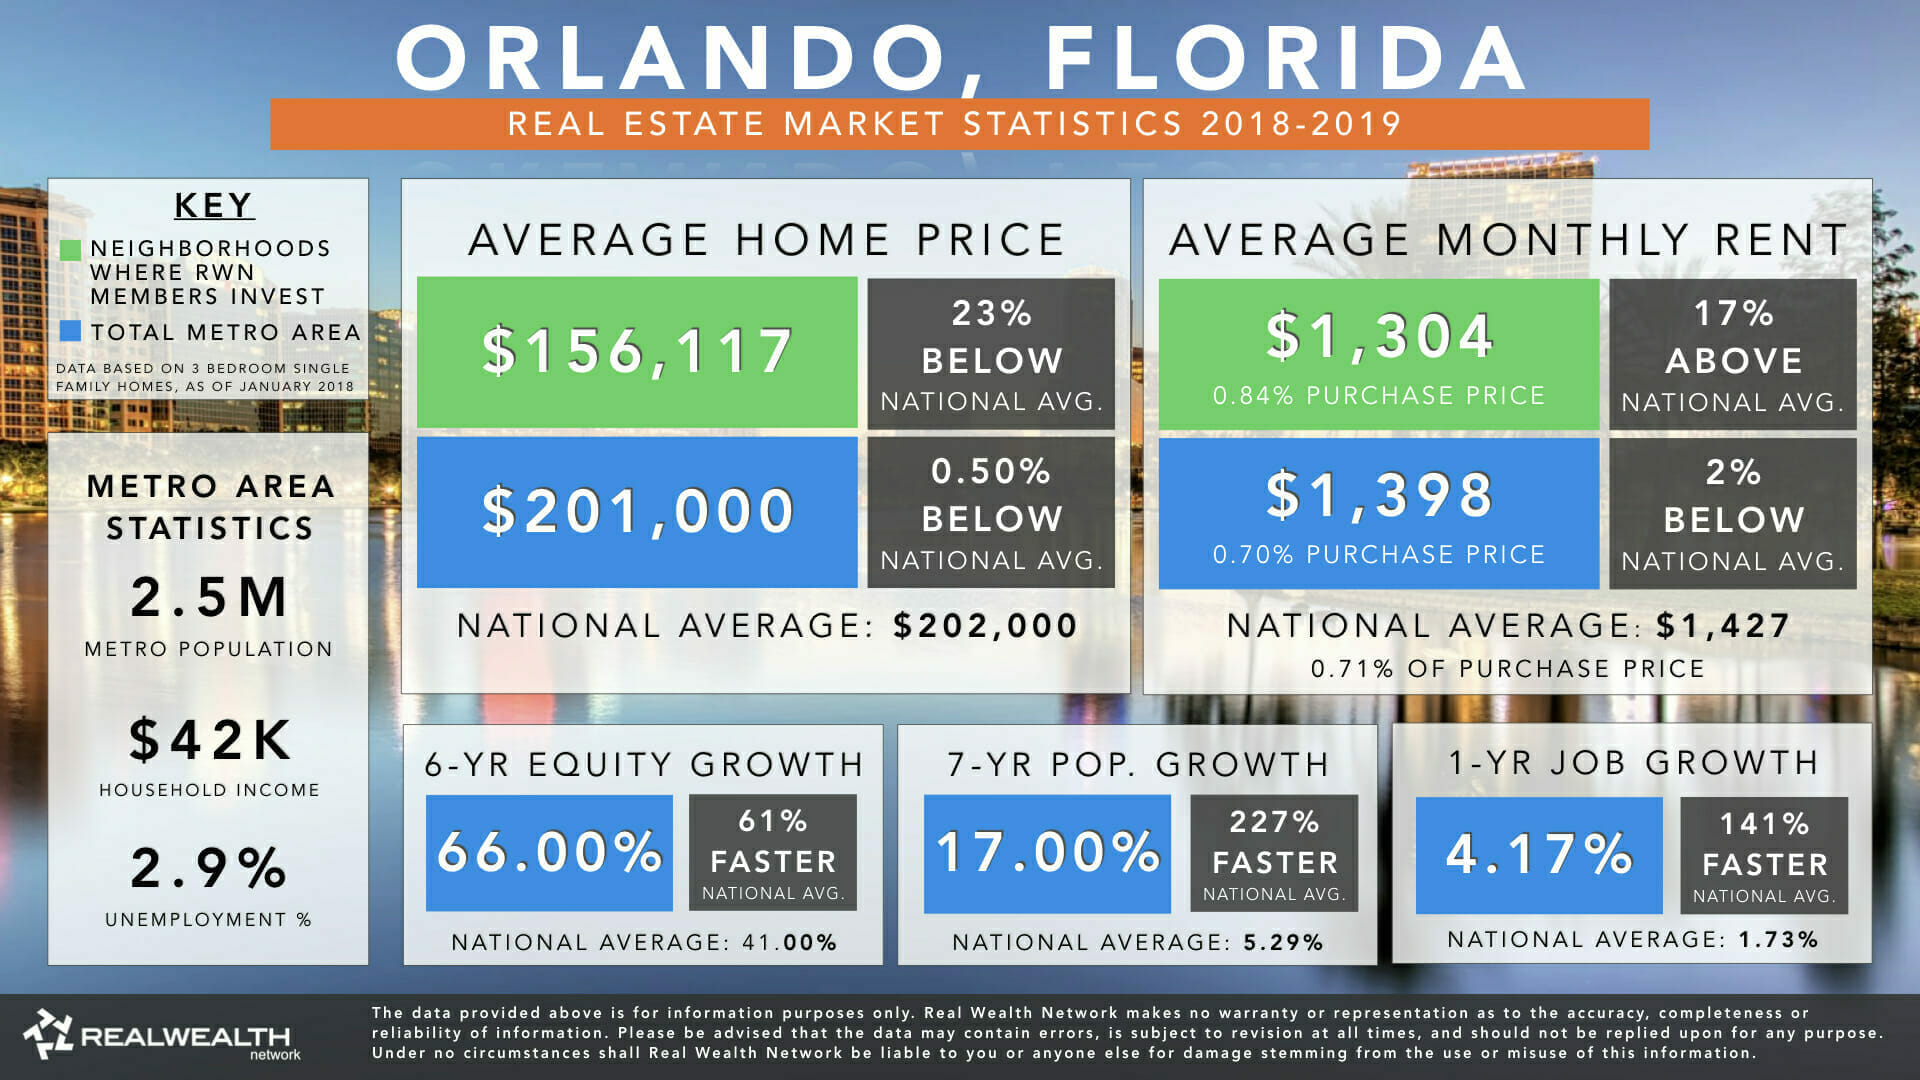 Orlando, Florida | Real Estate Market Statistics & Trends 2019